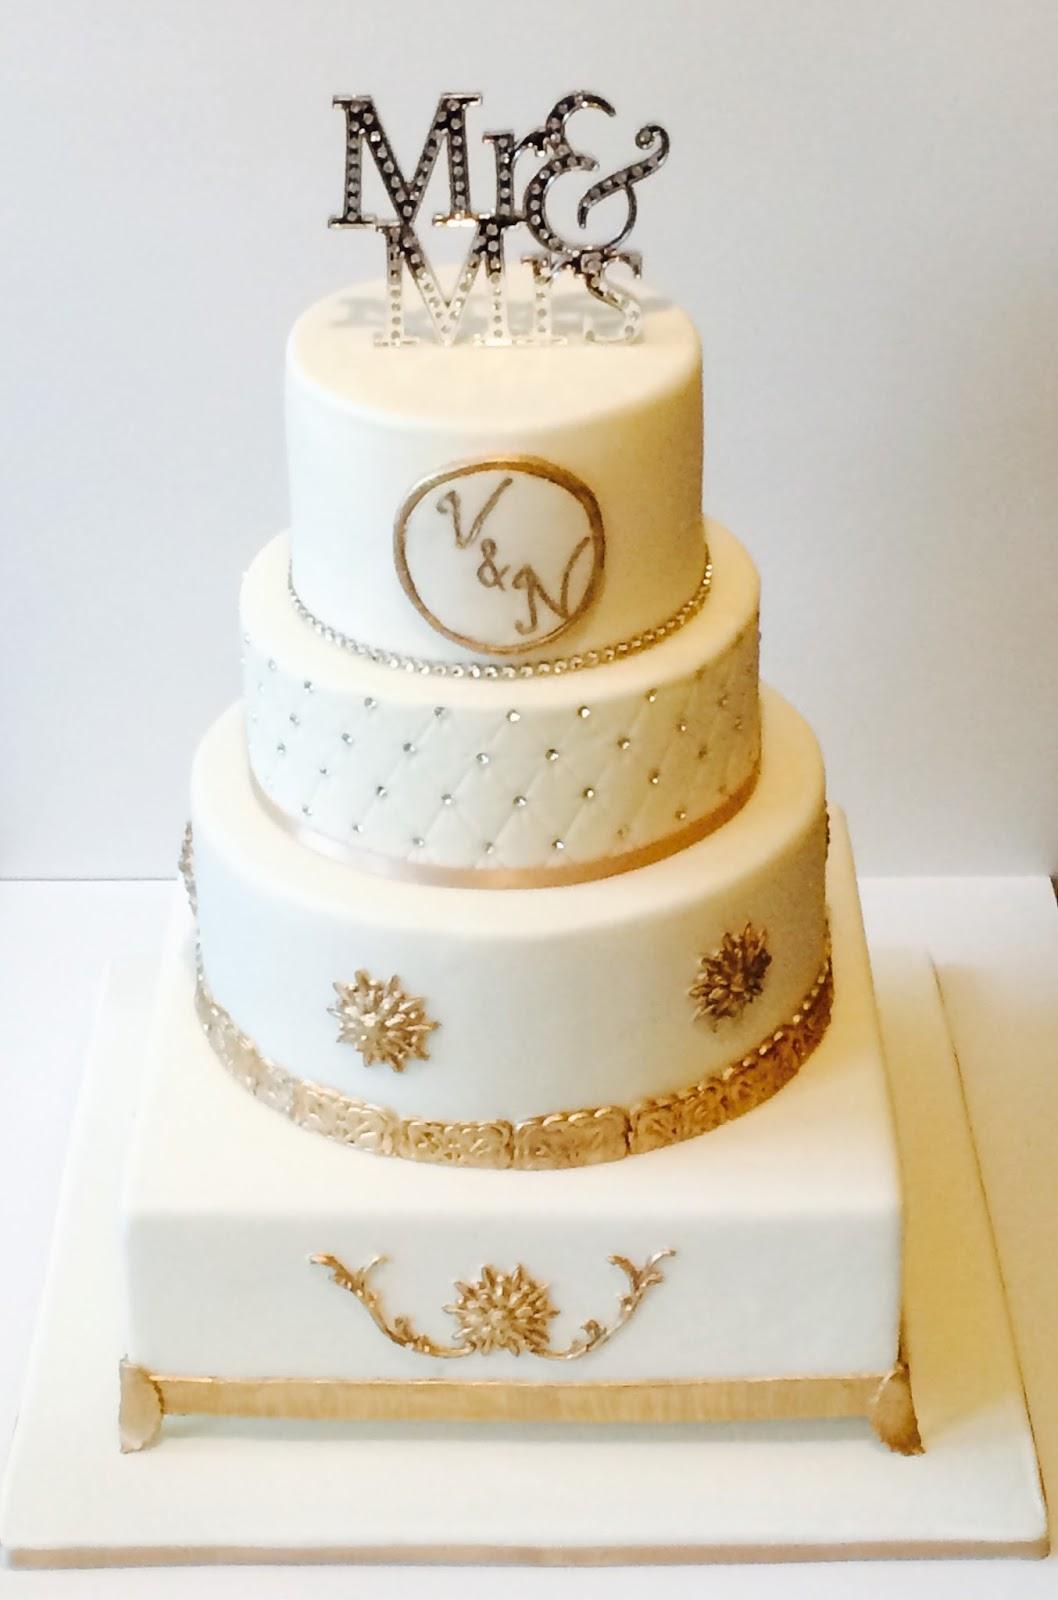 Cakes by Anne Motha